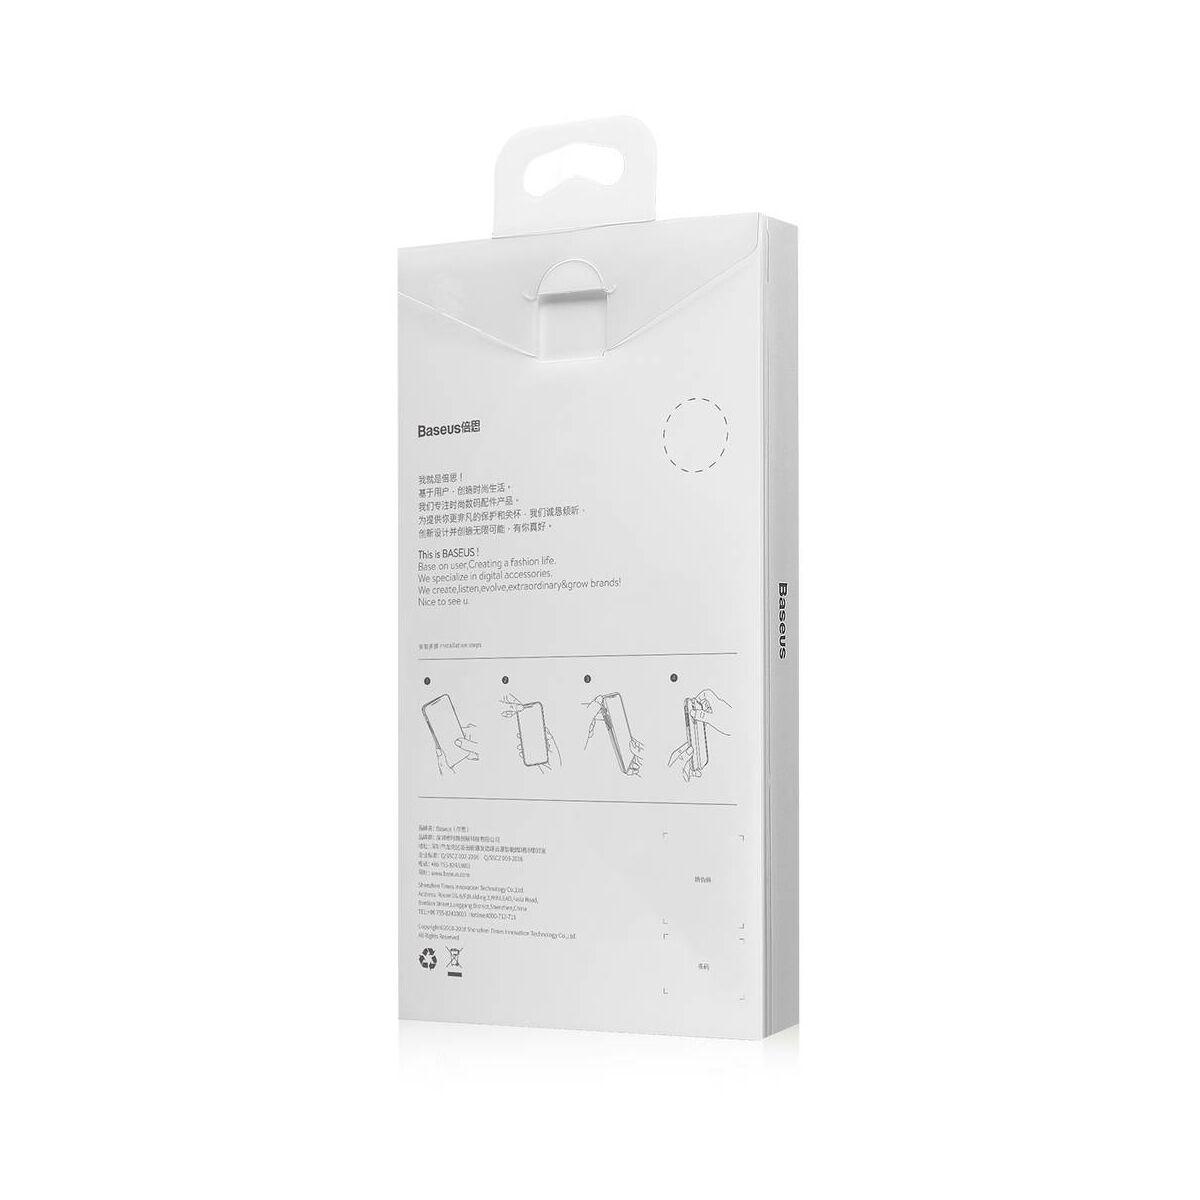 Baseus iPhone XR üveg & tok, BV Weaving, fekete (WIAPIPH61-BL01)